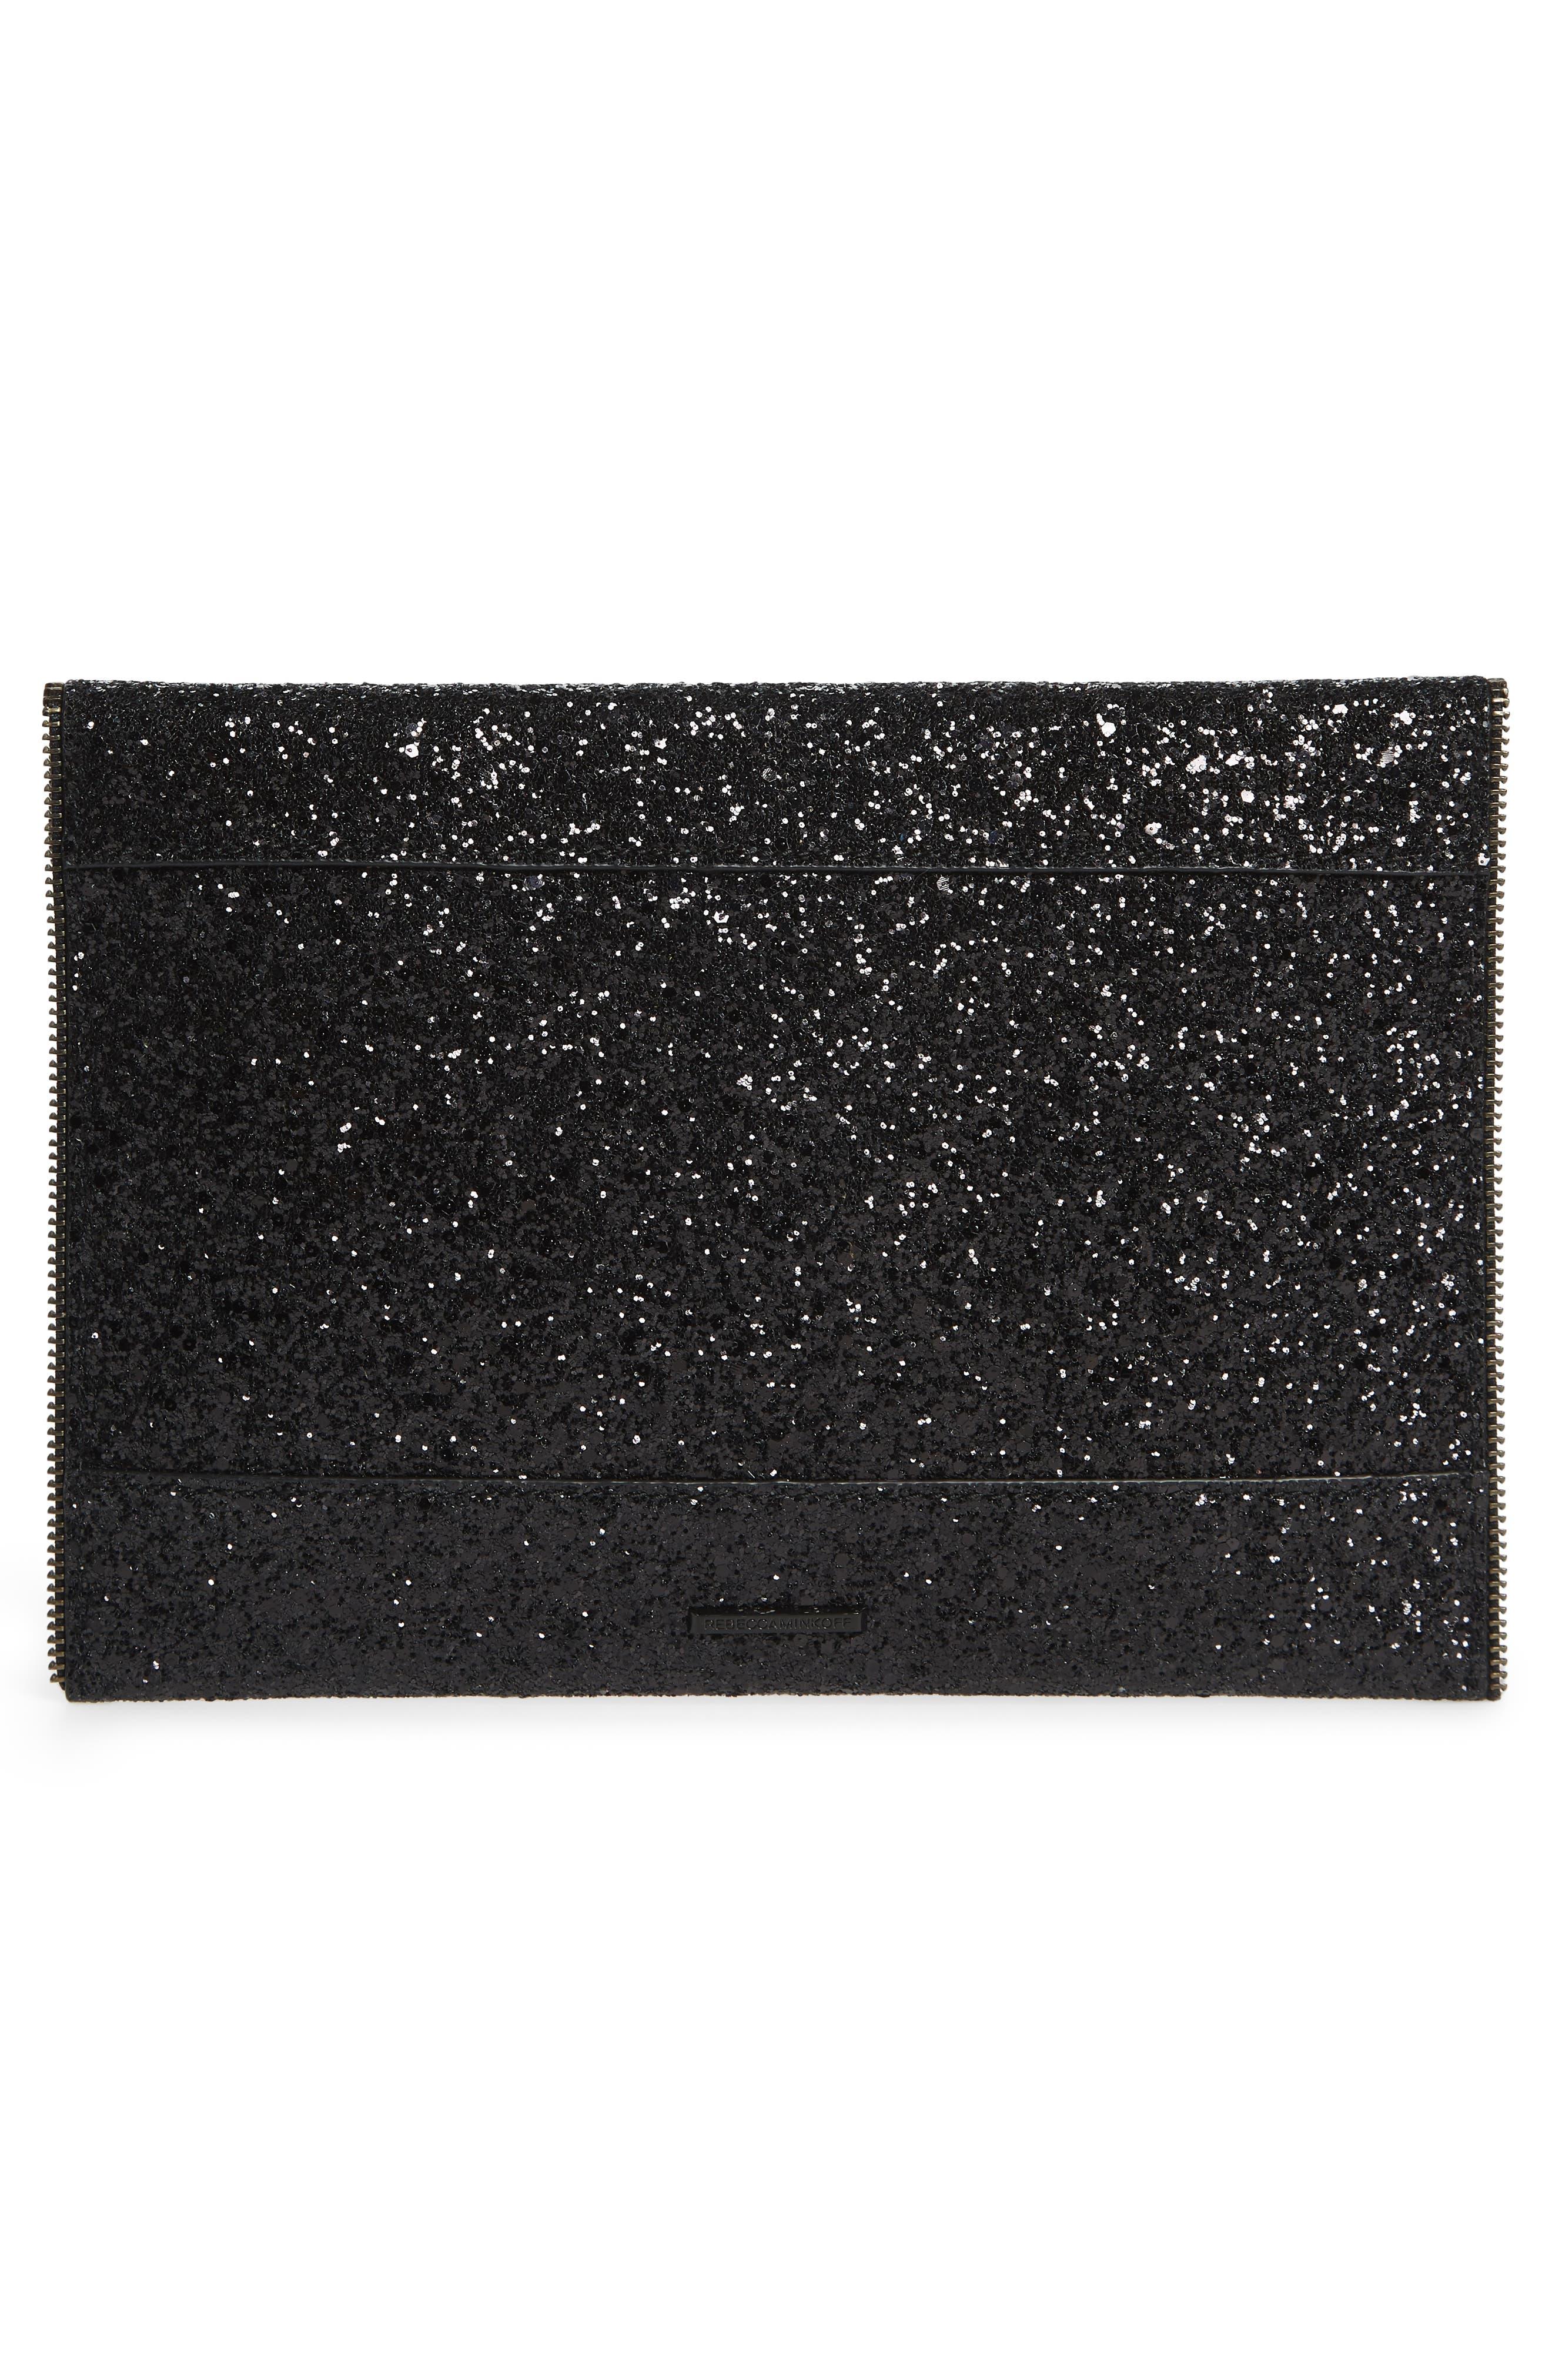 REBECCA MINKOFF, Leo Glitter Clutch, Alternate thumbnail 4, color, BLACK MULTI/ BLACK HRDWR